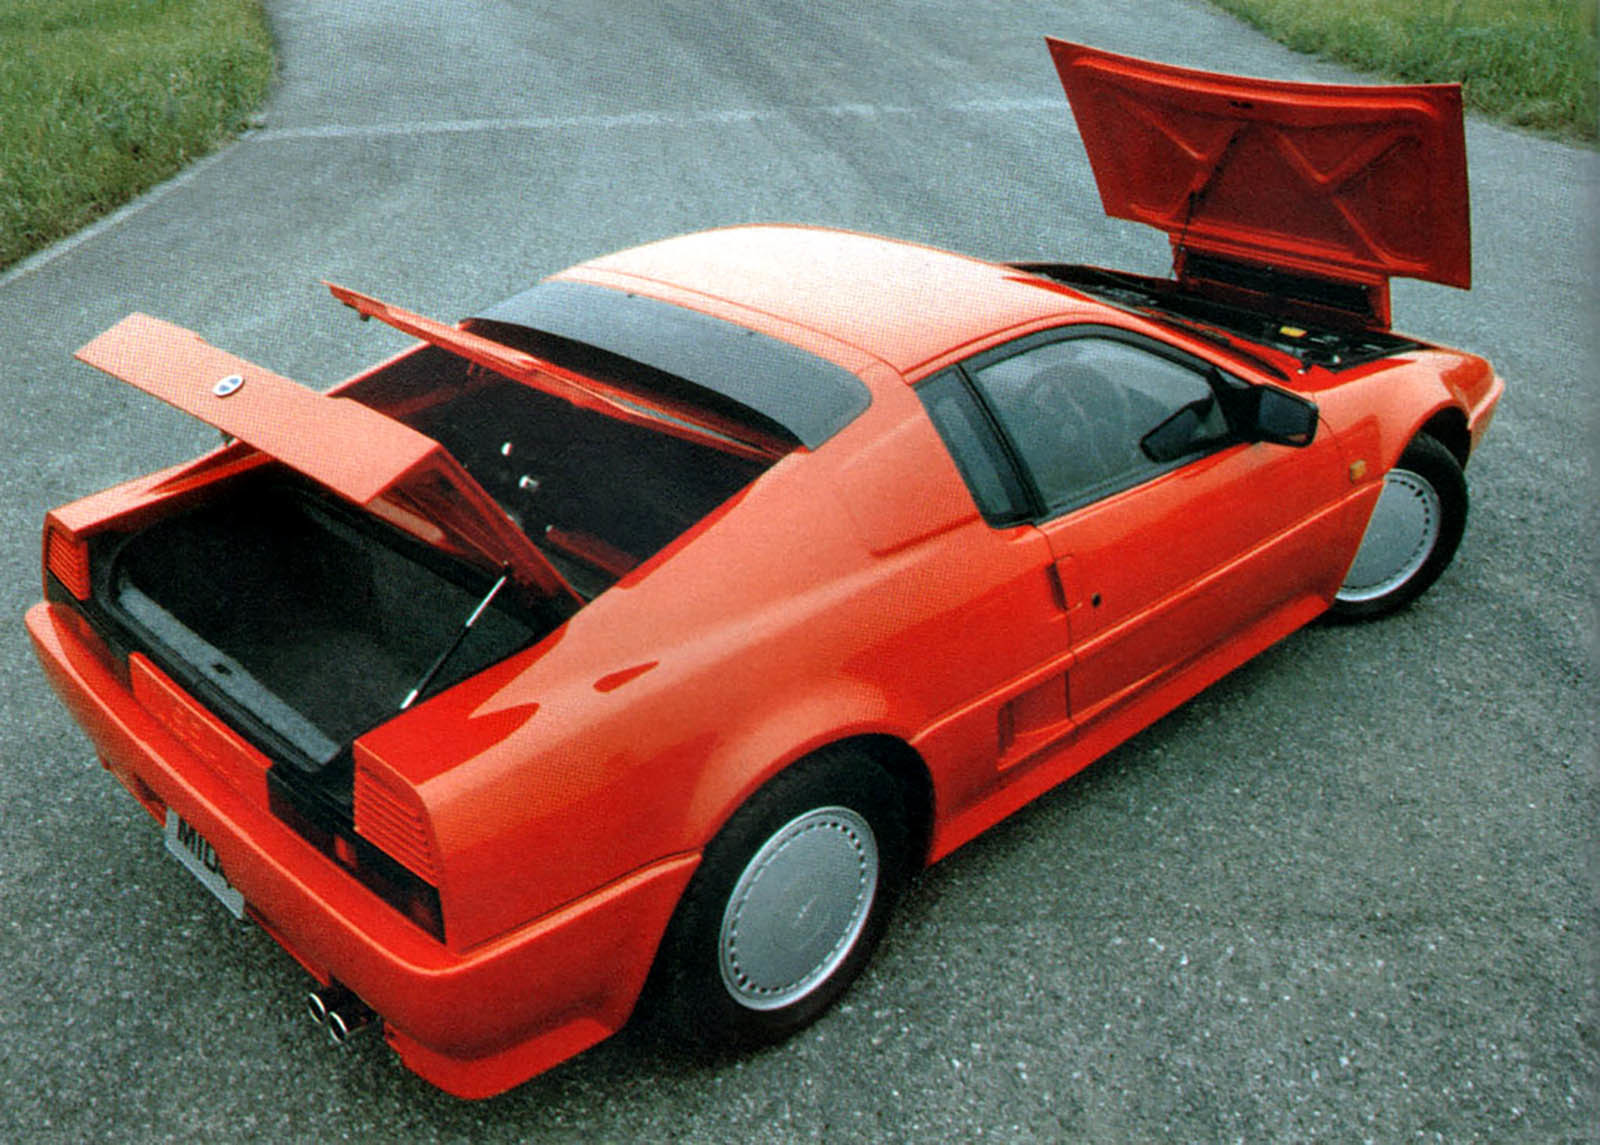 Nissan MID-4 Concept 1985